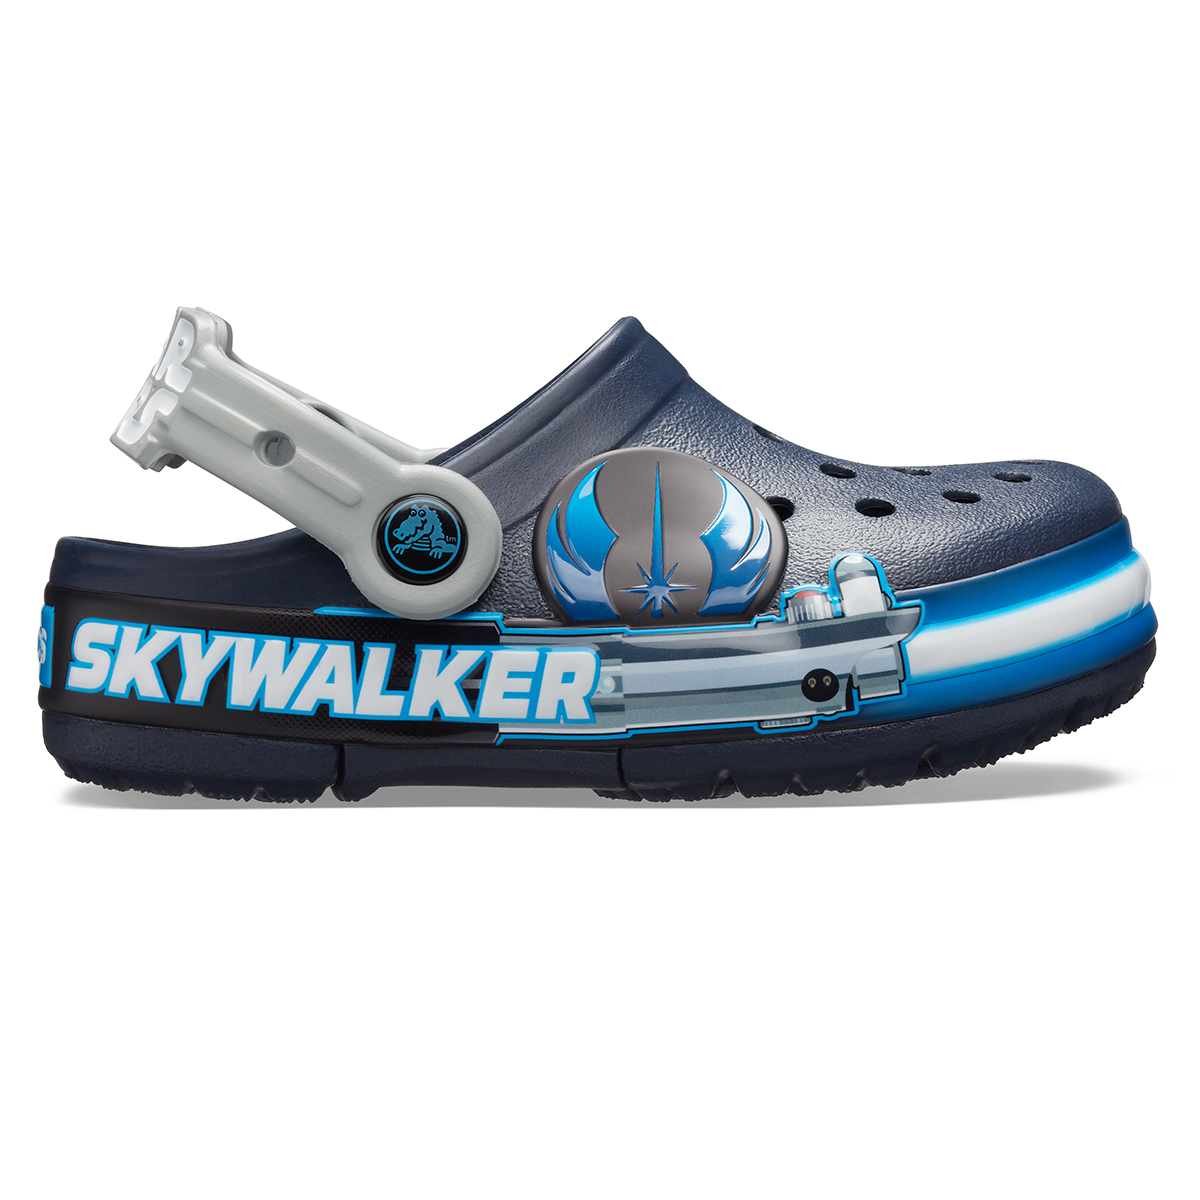 CrocsFL Lt Cg Luke Skywalker K - Lacivert